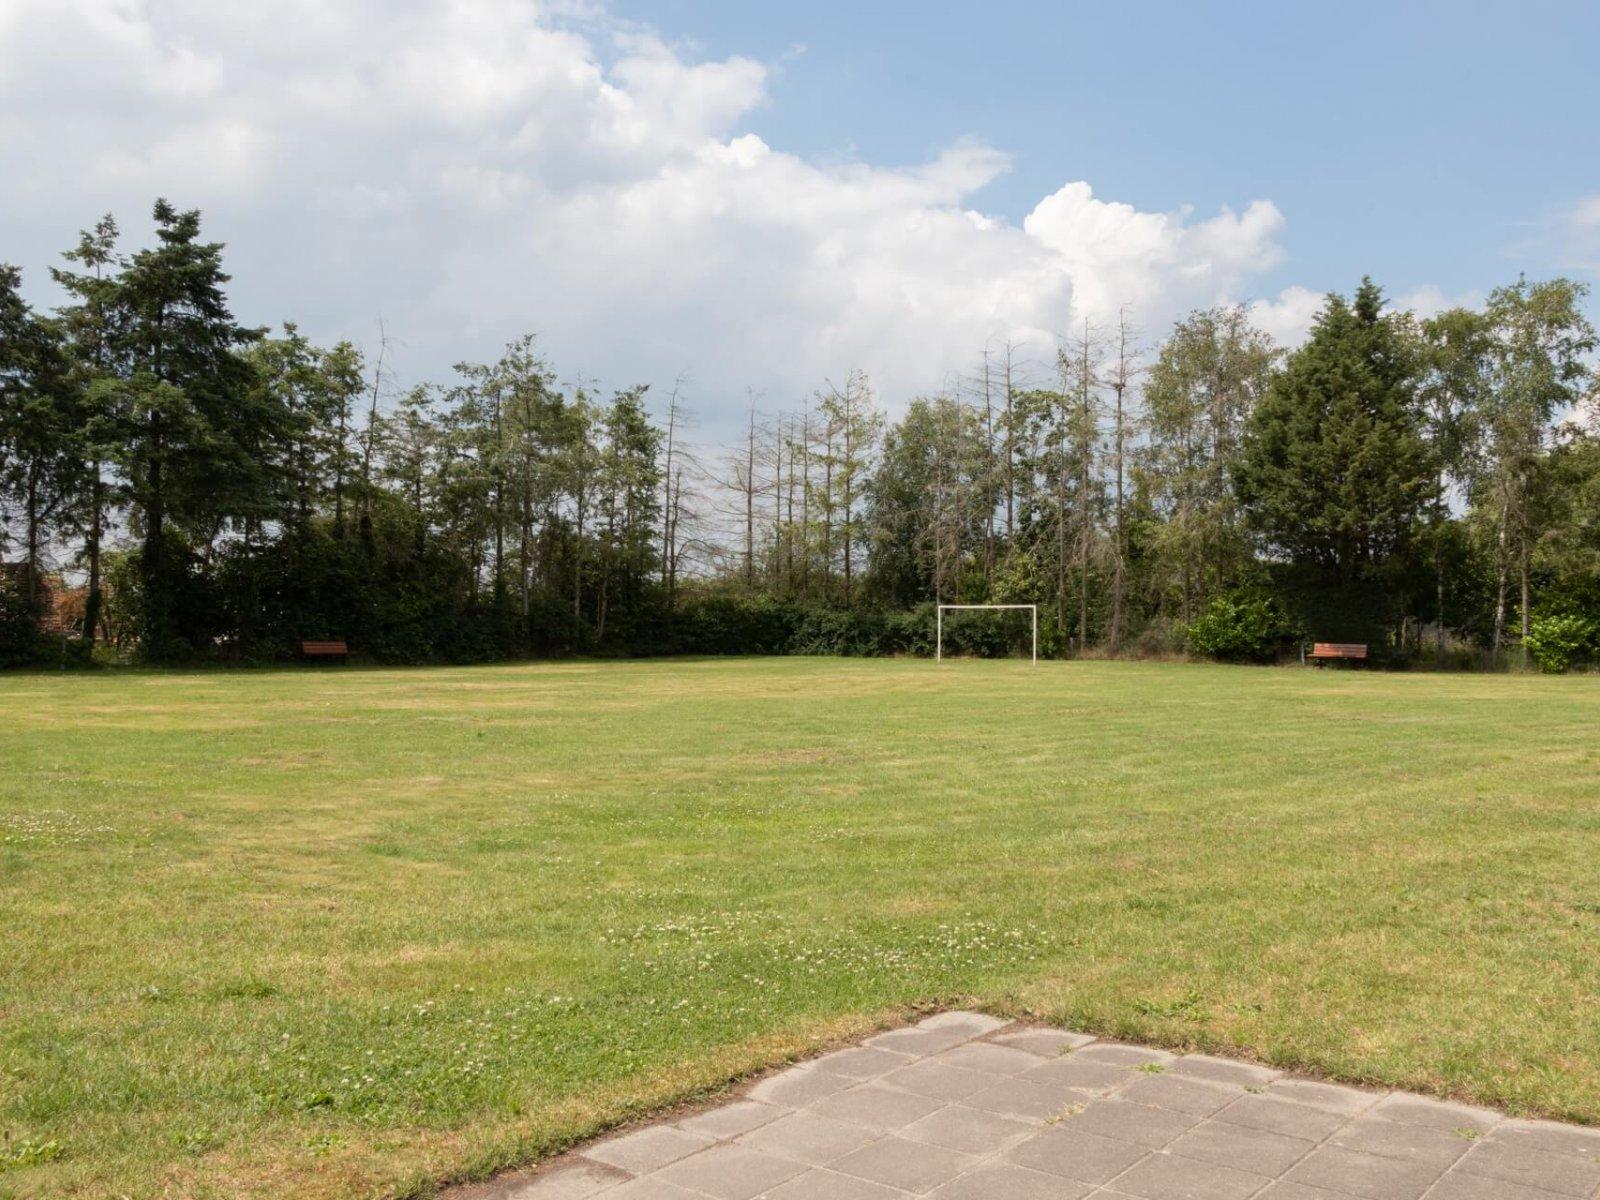 Kampeerboerderij-De-Reehoeve-Groepsaccommodatie-De-Reebok-recreatieveld-3-e1